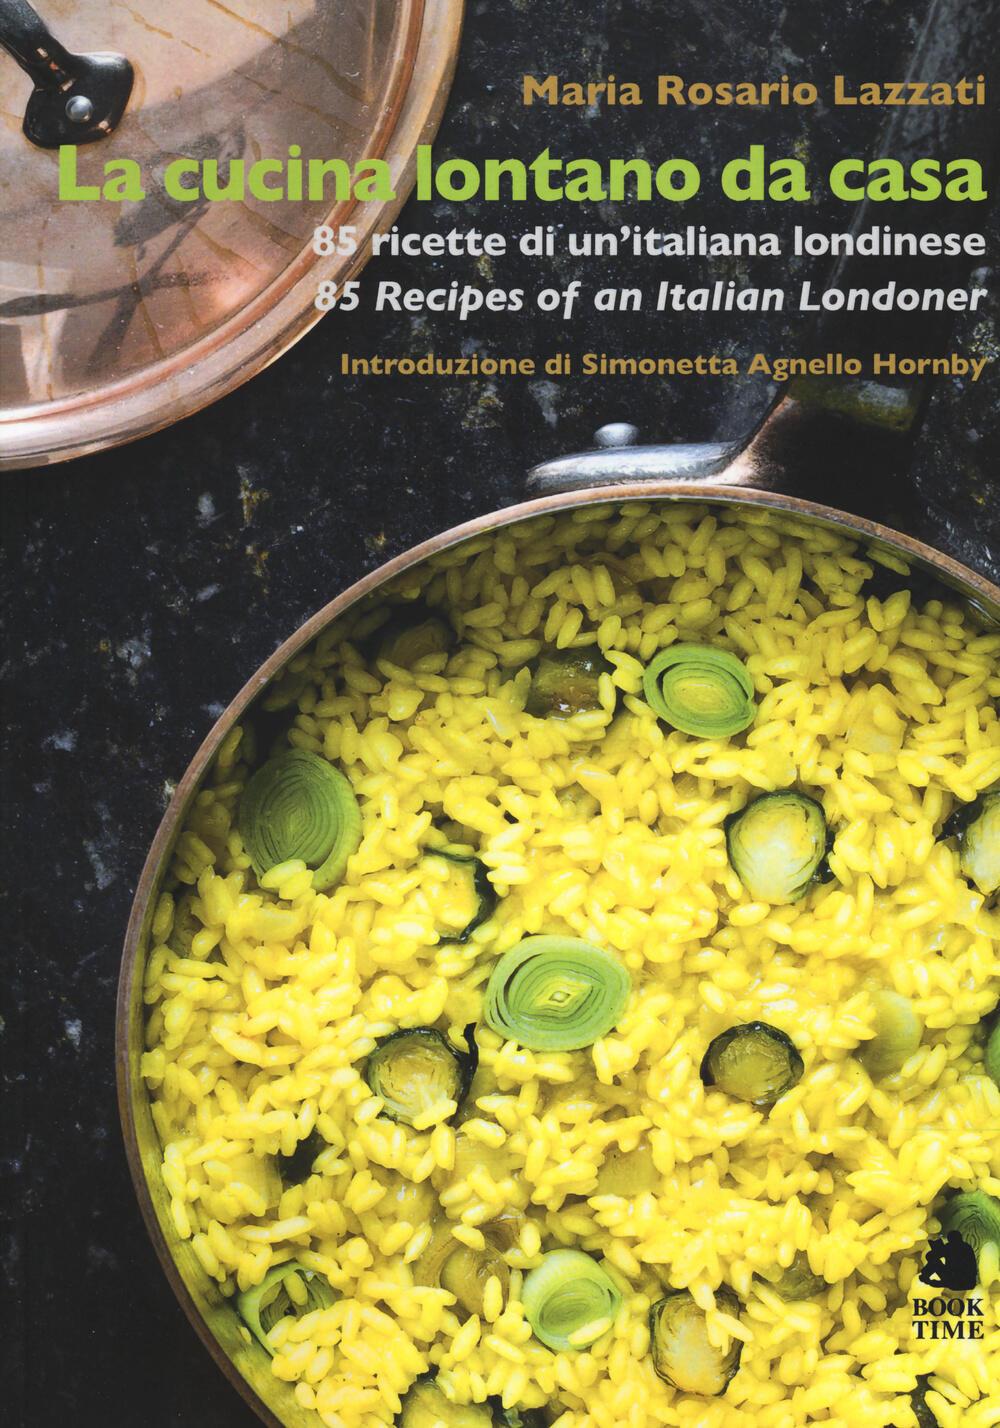 La cucina lontano da casa 85 ricette di un 39 italiana londinese 85 recipes of an italian londoner - Cucina italiana di casa ...